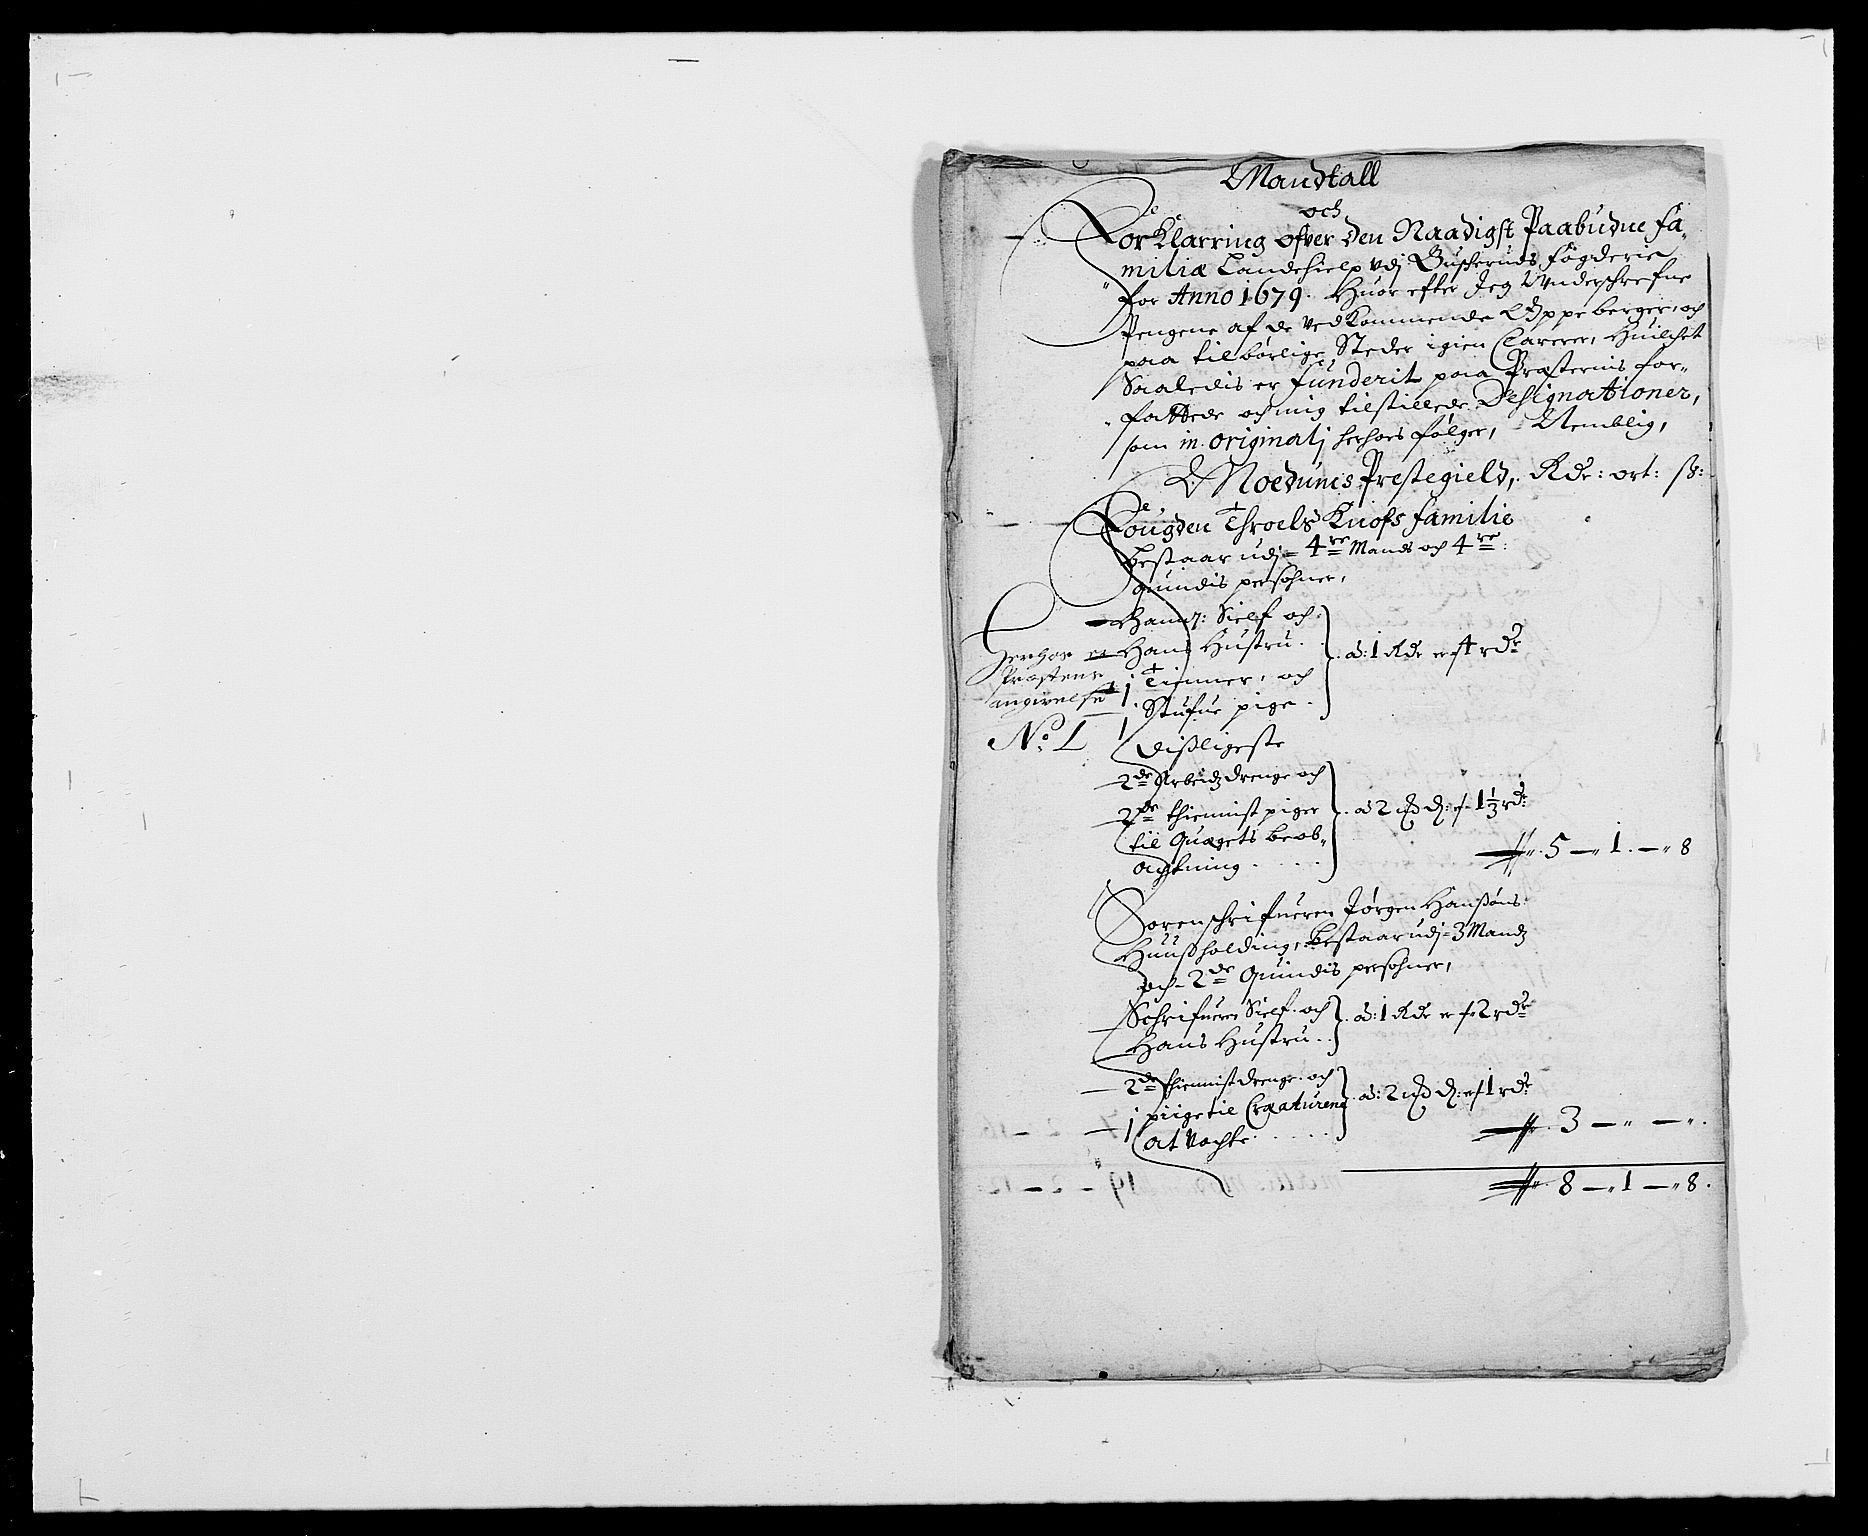 RA, Rentekammeret inntil 1814, Reviderte regnskaper, Fogderegnskap, R25/L1674: Fogderegnskap Buskerud, 1678-1681, s. 332